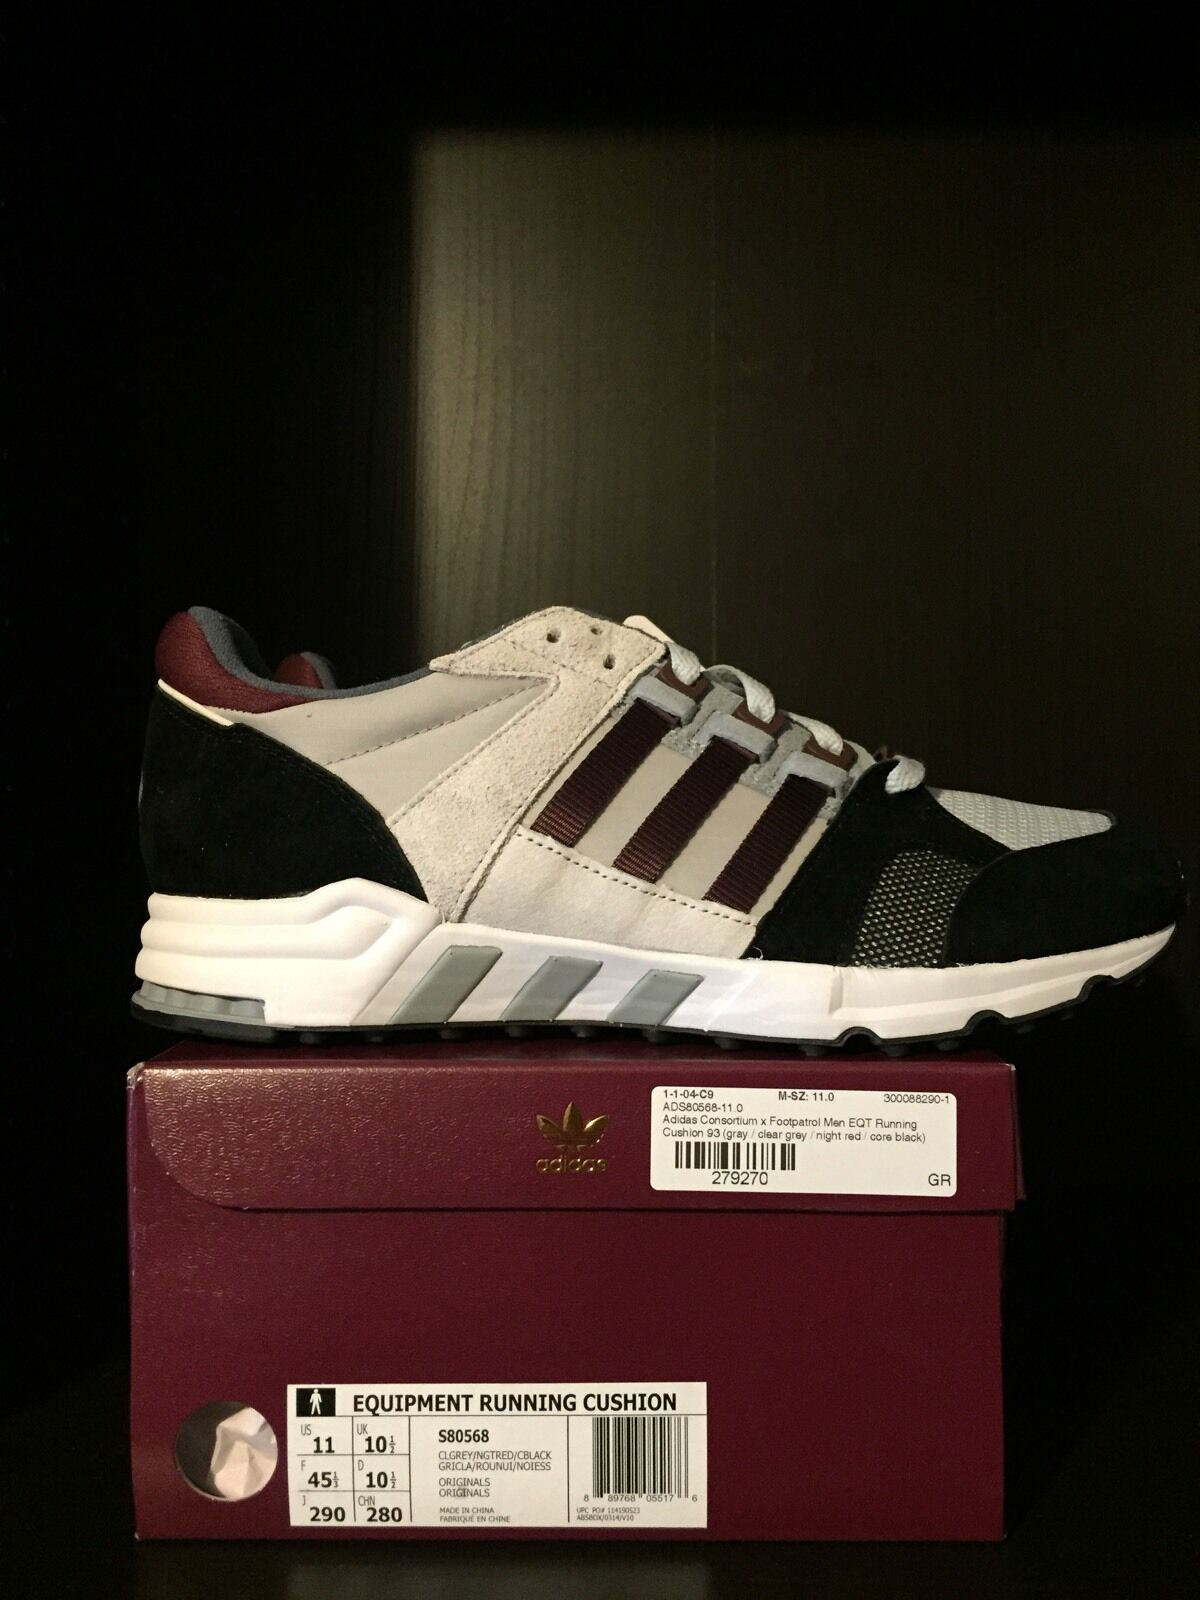 Footpatrol x Adidas Consortium EQT - US Size 11